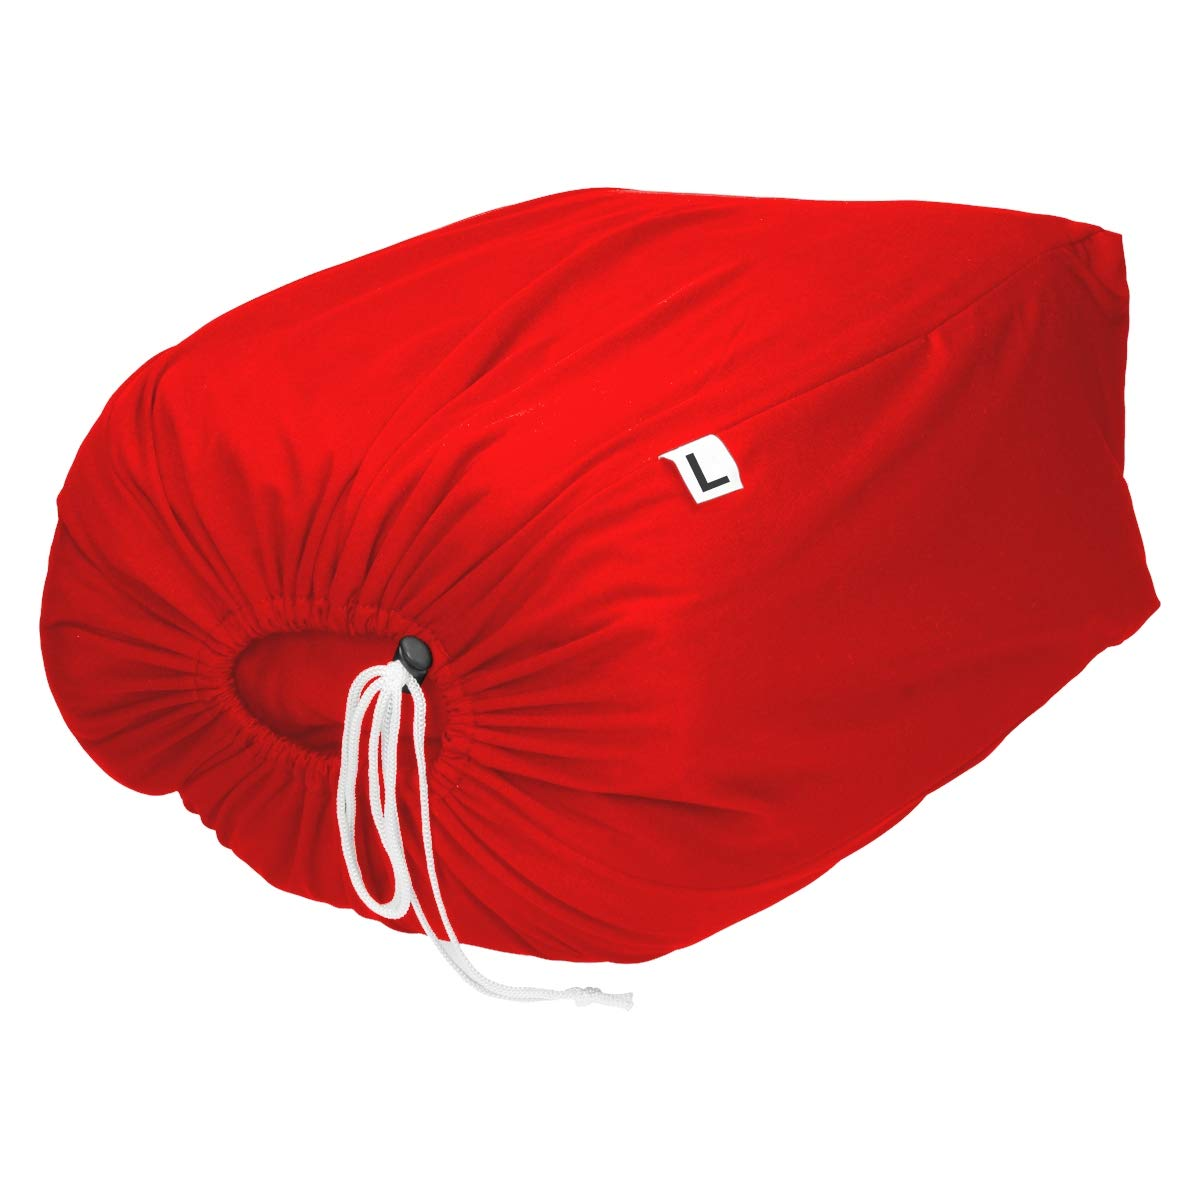 Ideal para uso profesional Transpirable Lona de protecci/ón auto Lona de vell/ón de microfibra Lona de coche cubierta Rojo ECD Germany Cubierta de coche interior tama/ño L 482 x 178 x 119cm